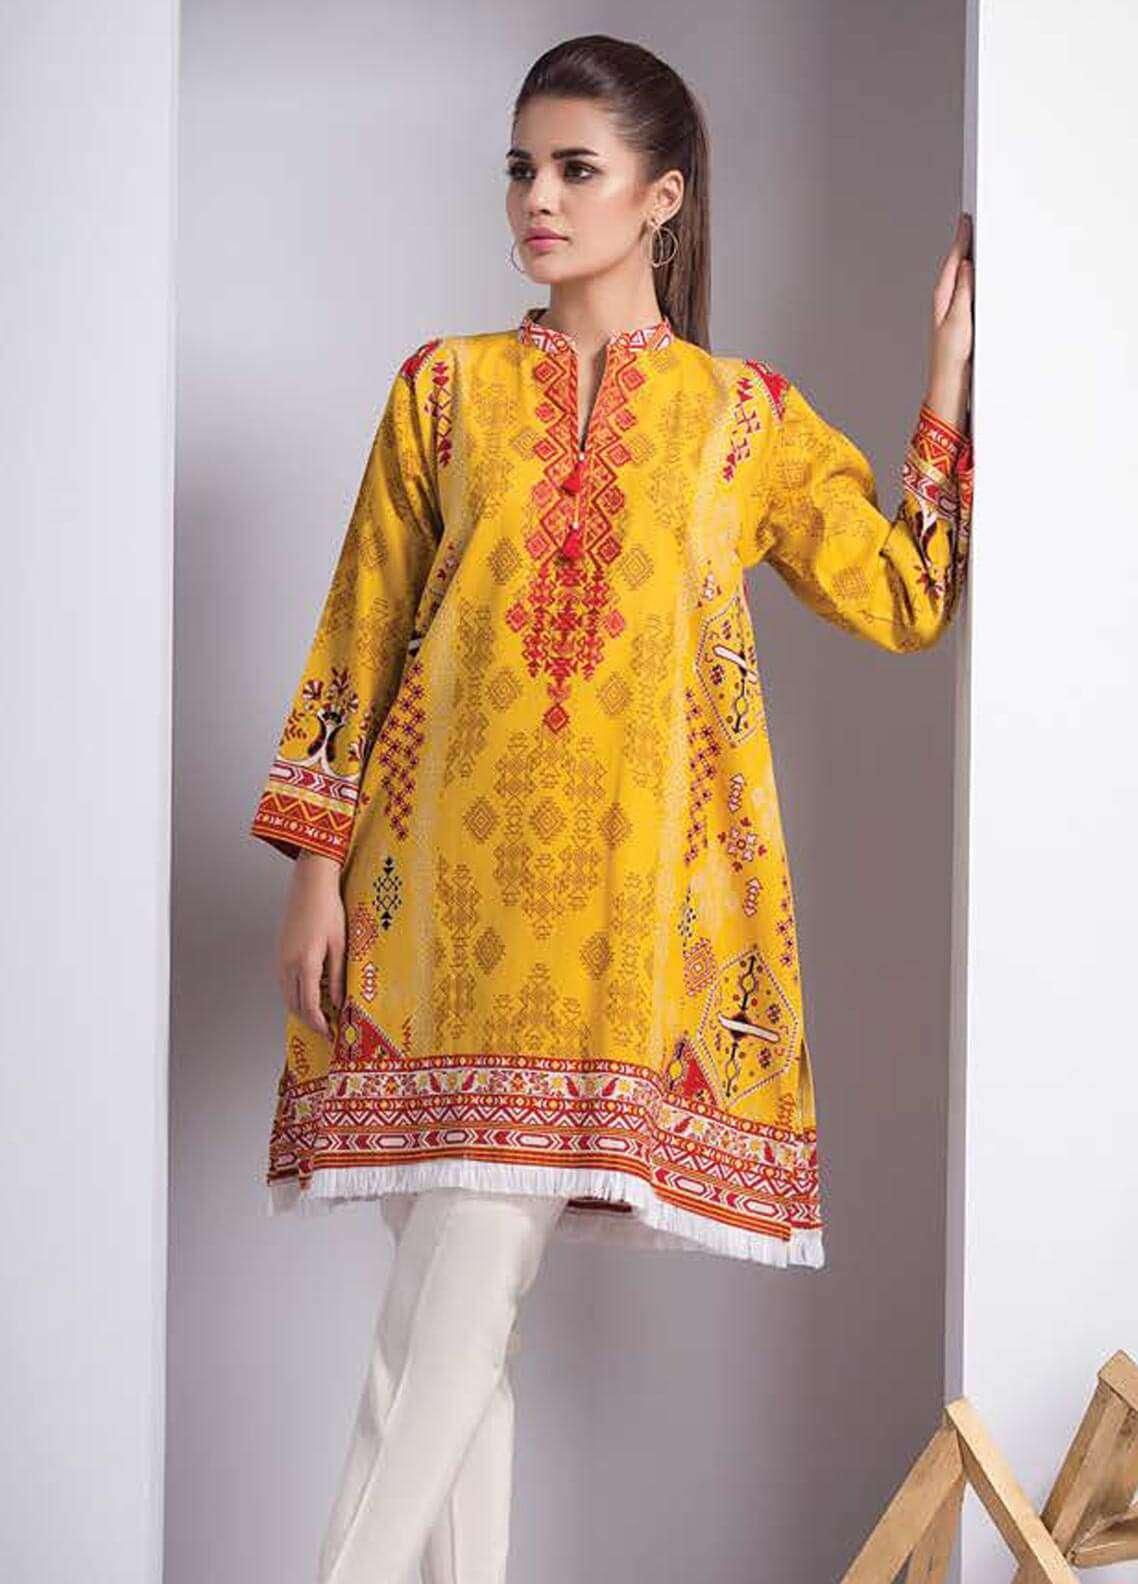 Orient Textile Embroidered Cotton Cotel Unstitched Kurties OT18W 208A Izmir - Winter Collection